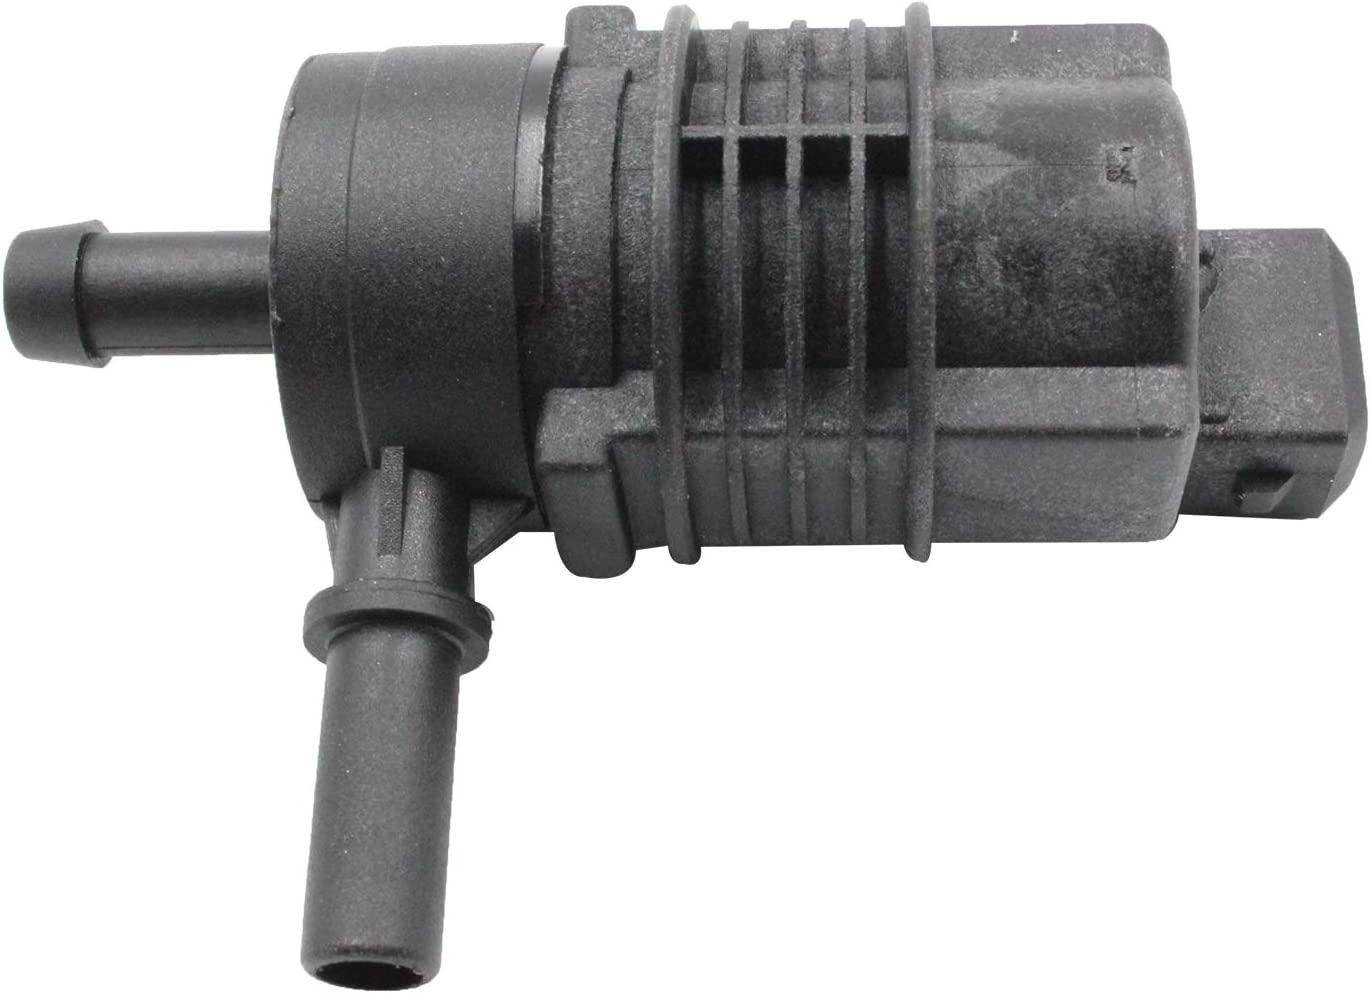 LOSTAR Fuel Tank Purge Vent Valve for Mercedes Benz W163 2124702793 1634700493